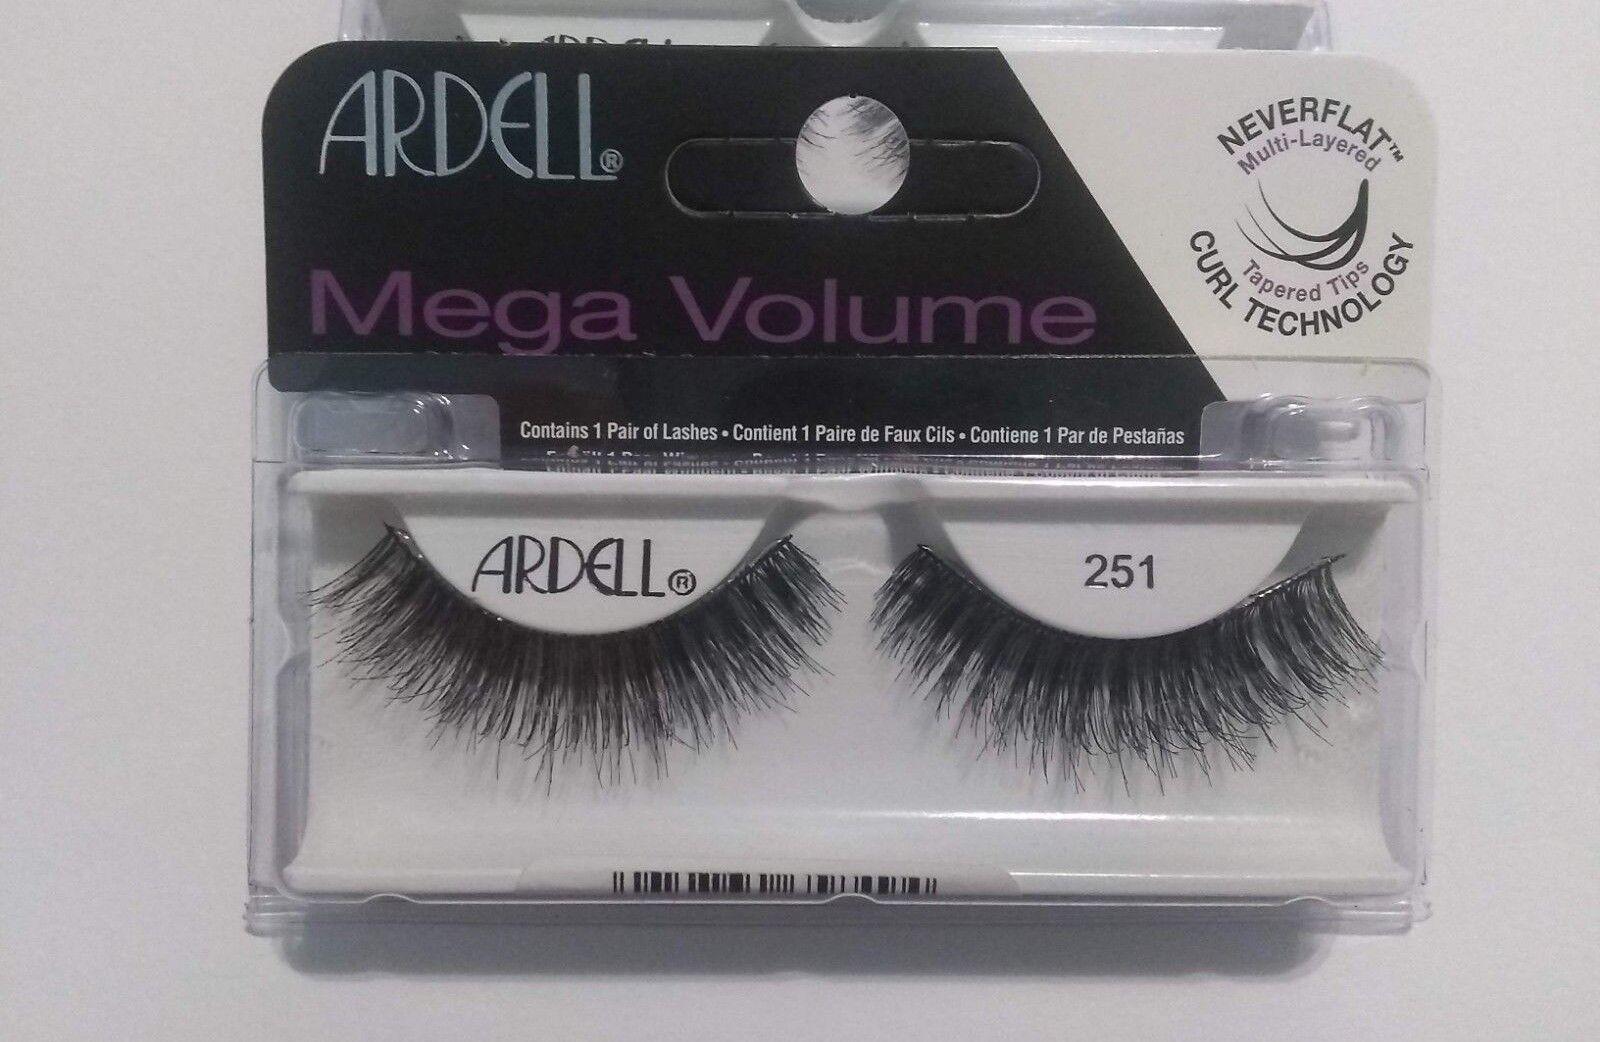 c6931f2f46f Buy 2 Pair Ardell Mega Volume False Eyelashes #251 Black online | eBay